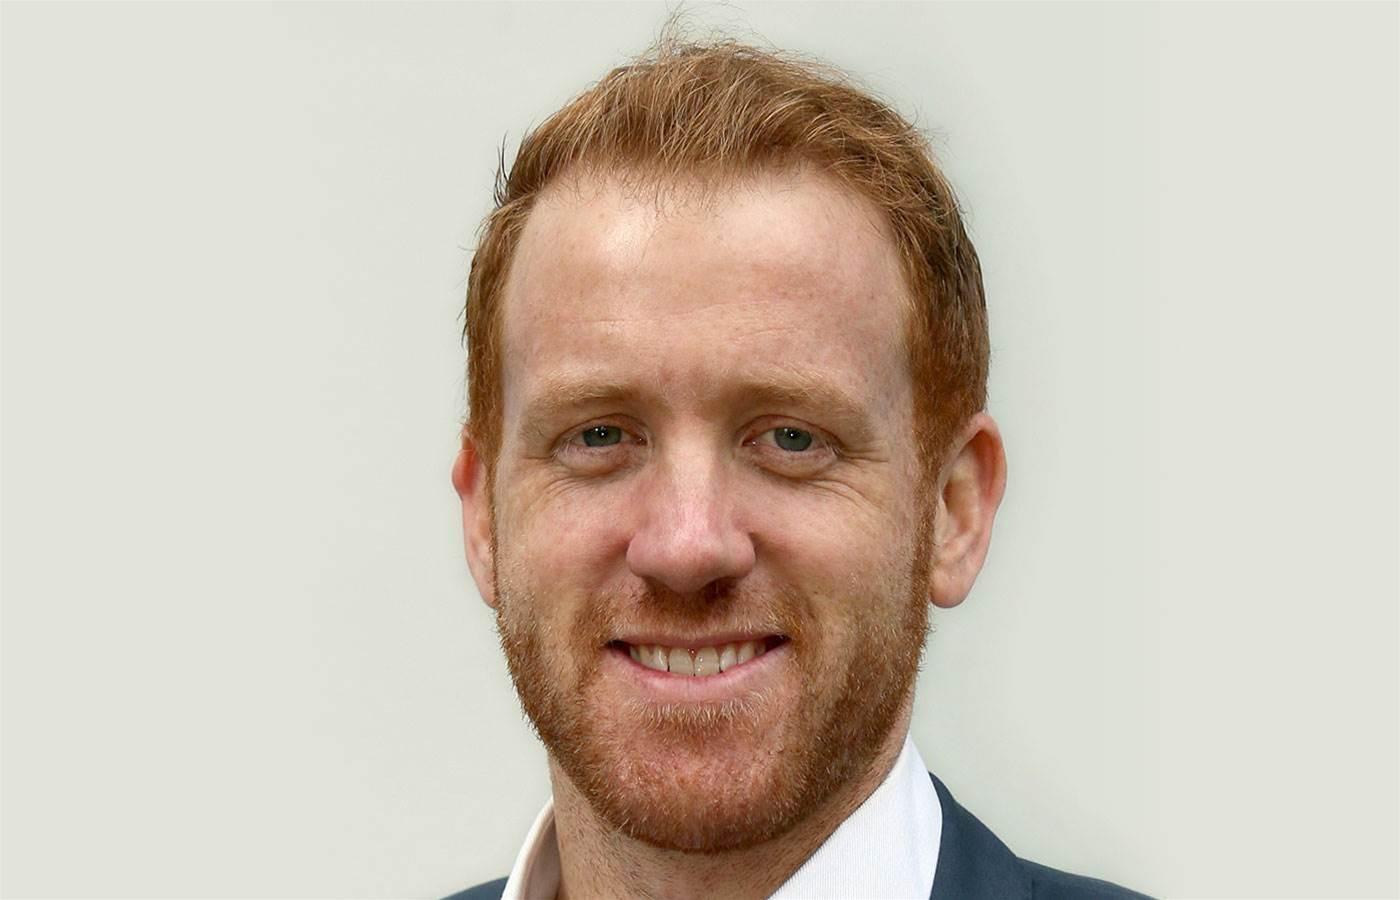 Canalys hires former CRN editor Steven Kiernan as senior director for worldwide business development